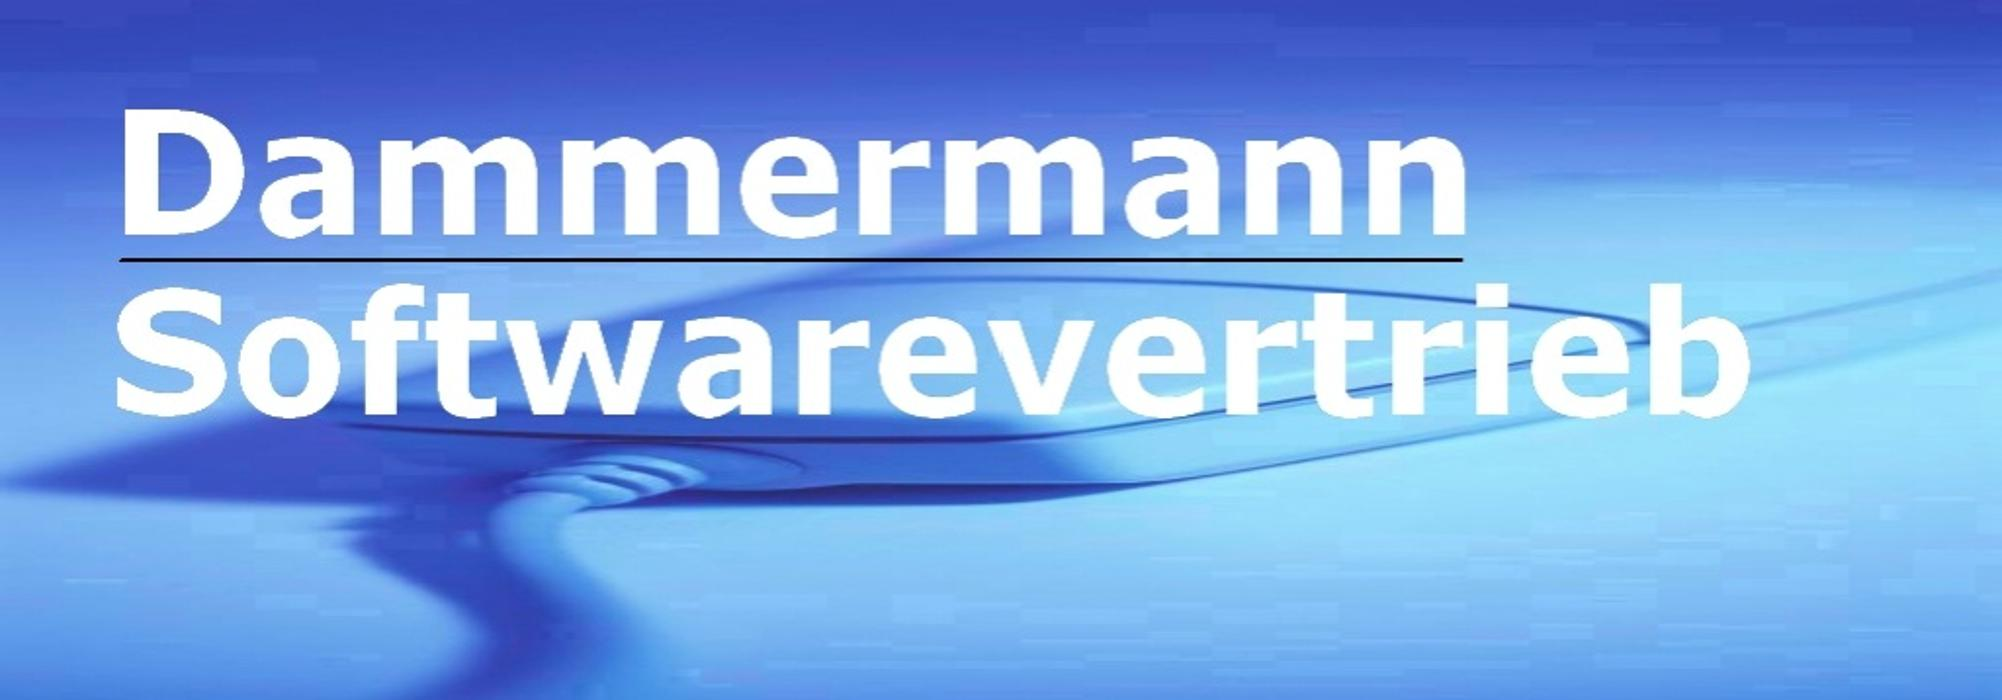 Dammermann Softwarevertrieb